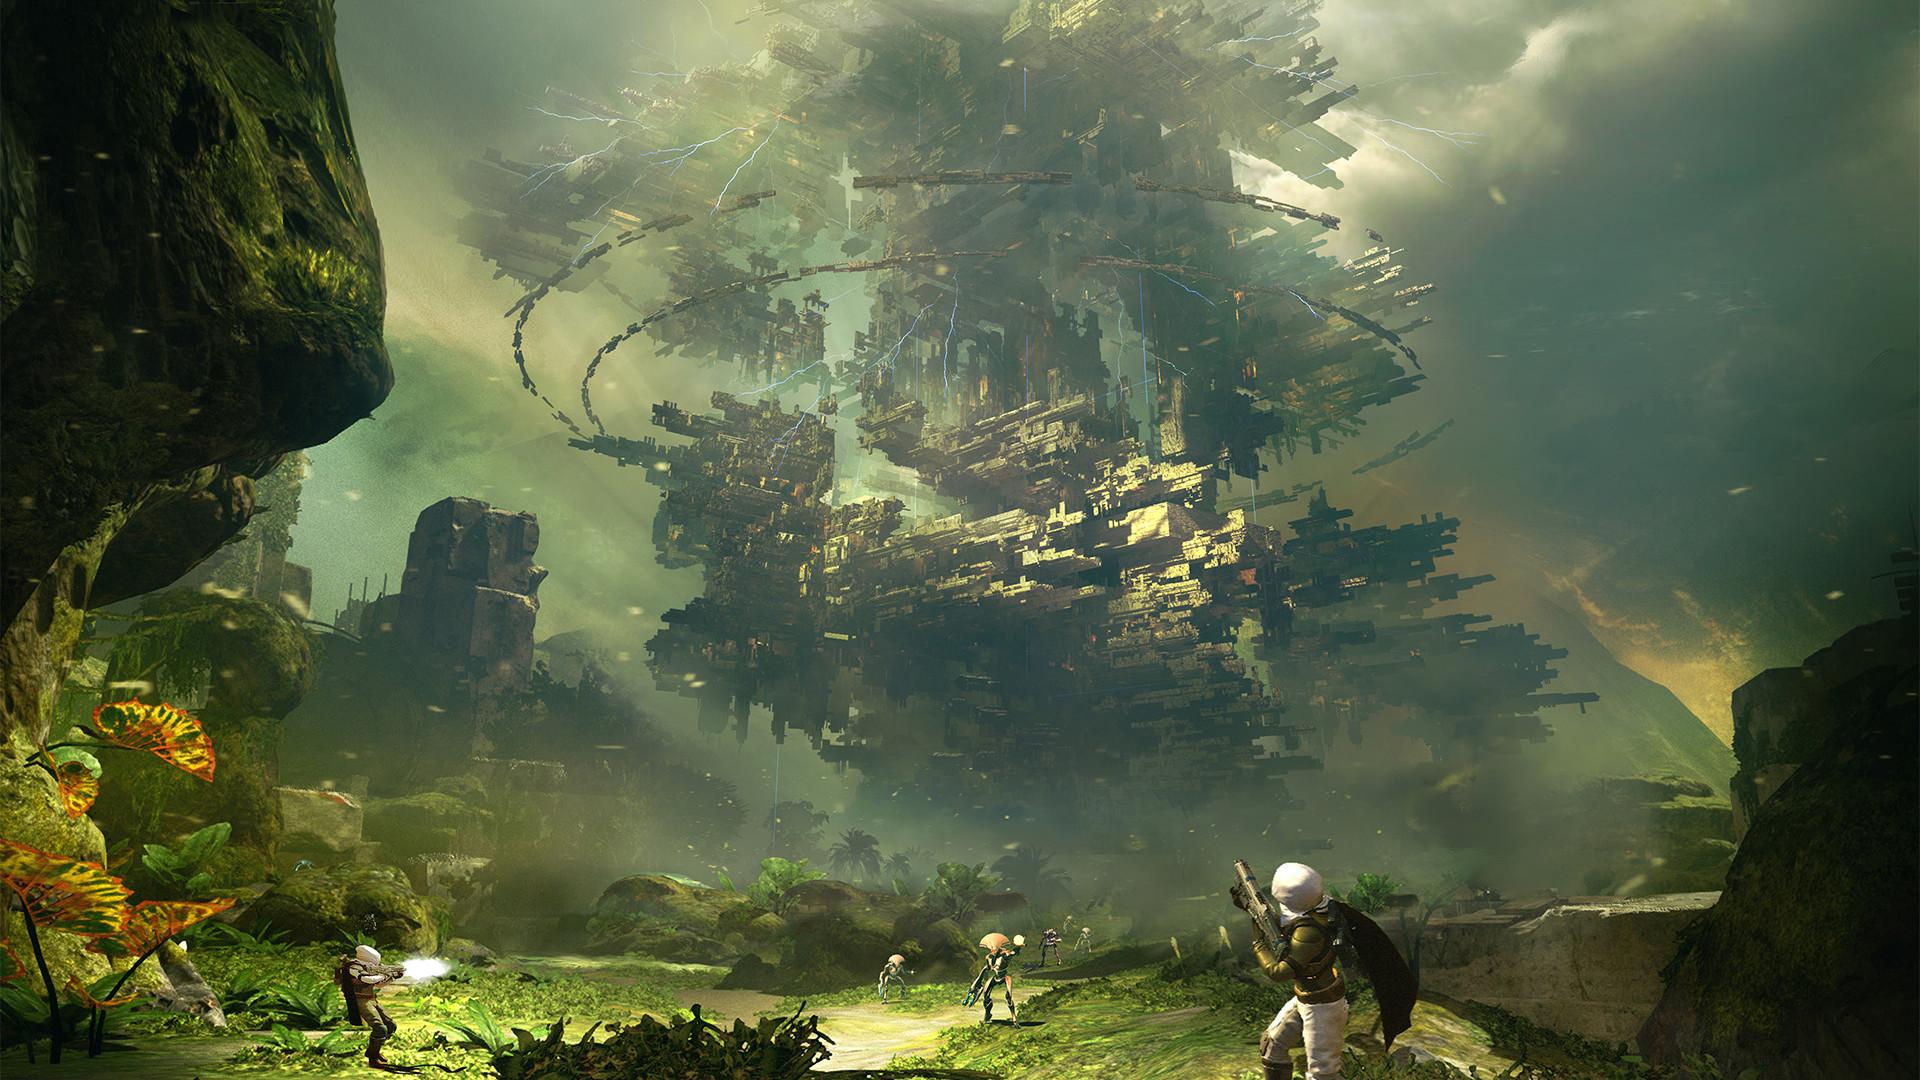 High Resolution Awesome Fantasy Sci Fi Landscape Wallpaper HD 3 .